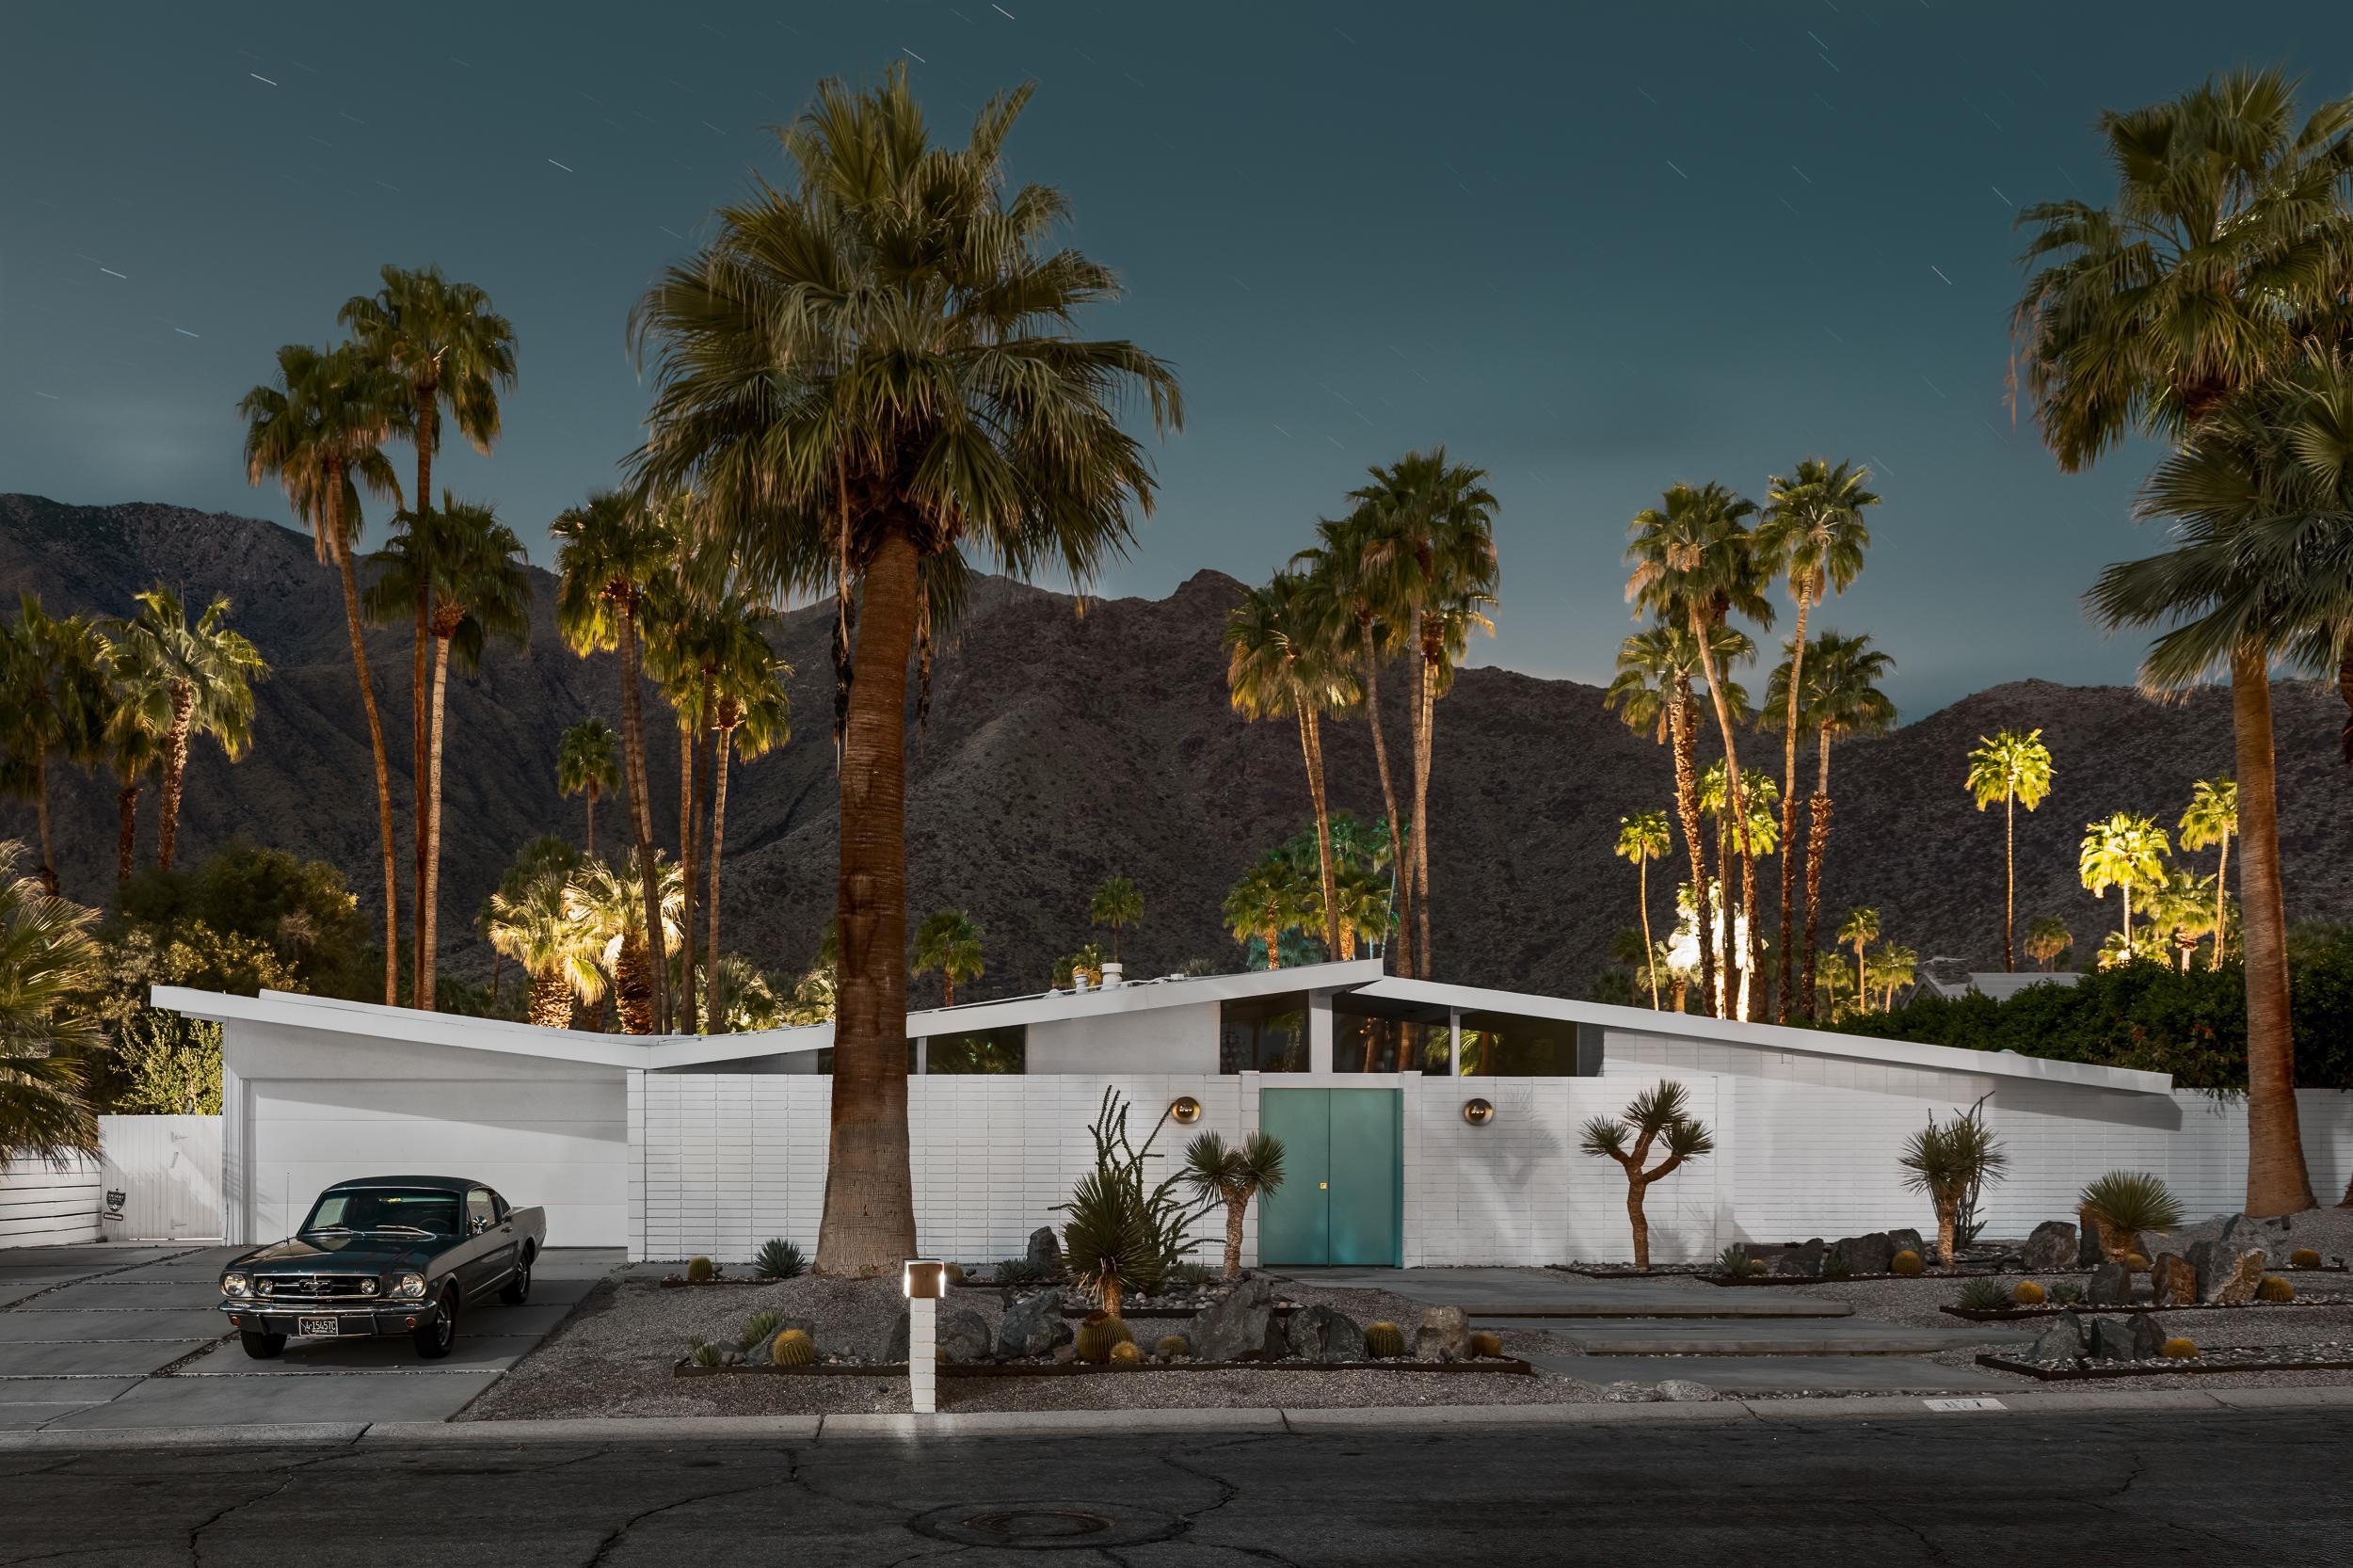 Tom Blachford Mid Century Modern Architecture Classic Mustang